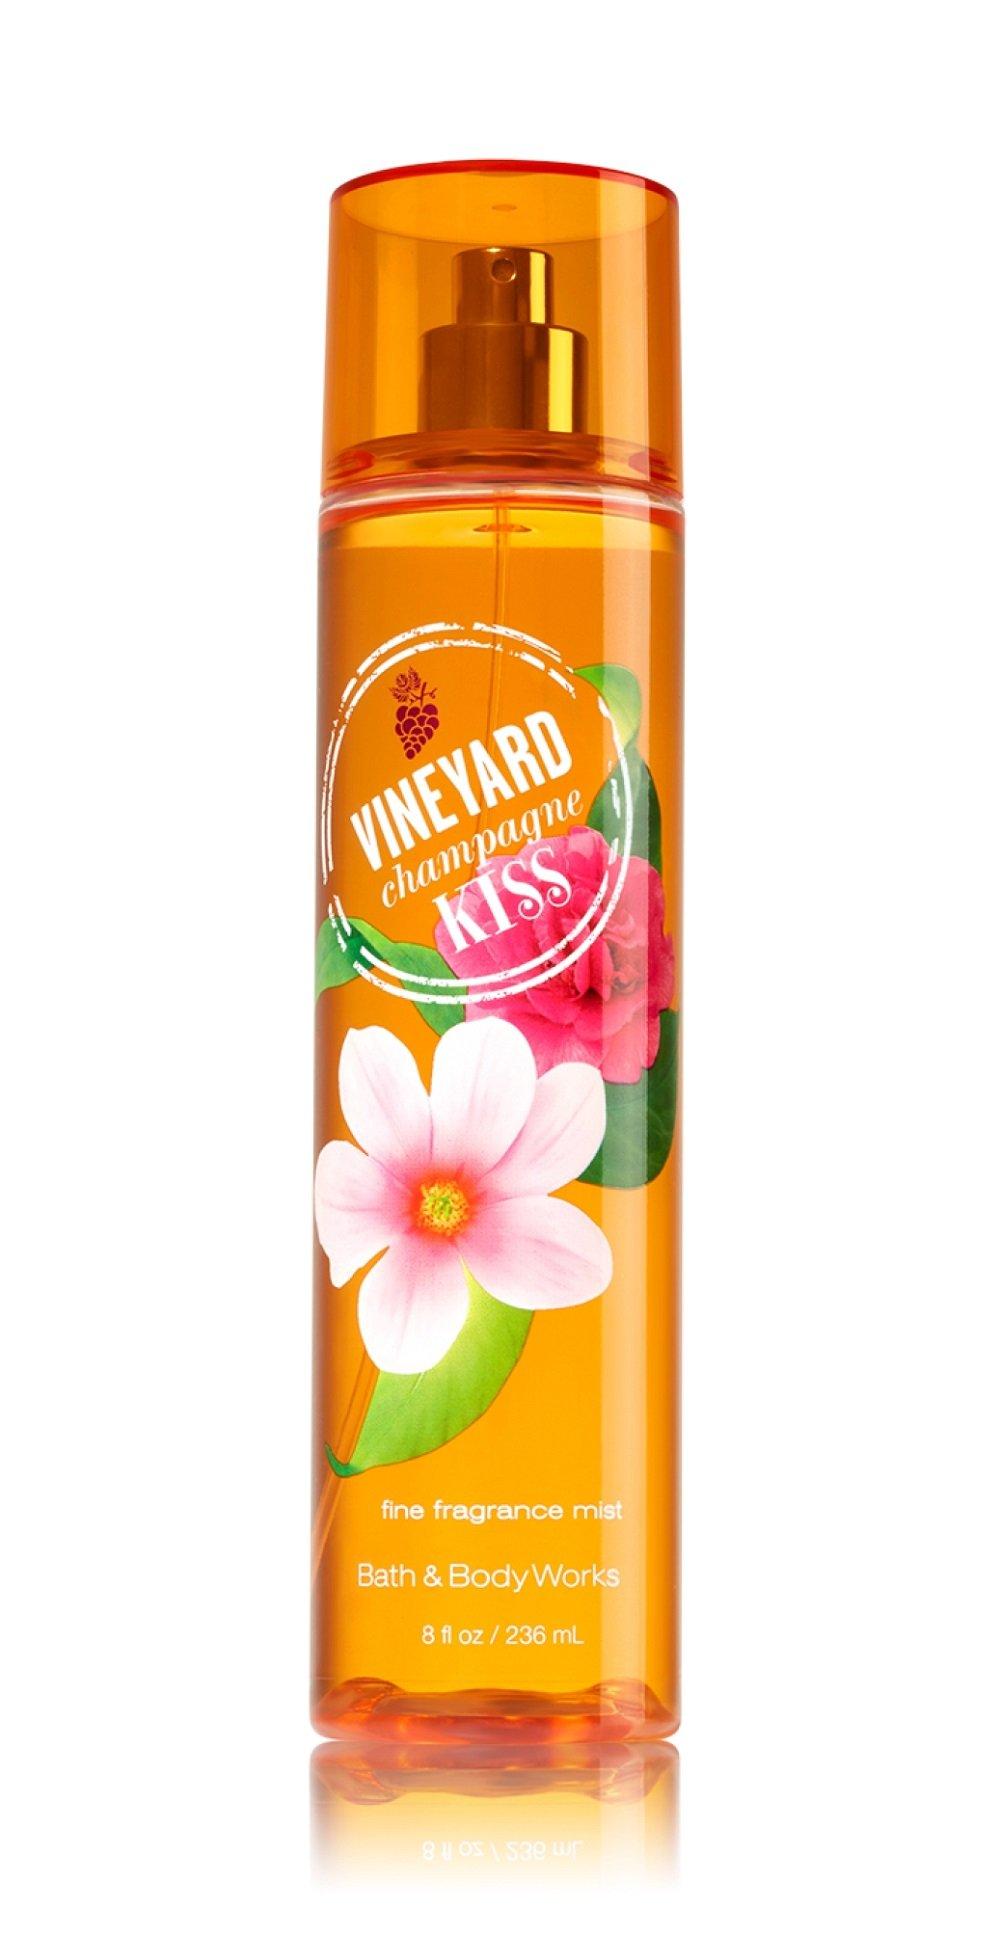 Bath aand Body Works - Bath and Body Works Vineyard Champagne Kiss Fine Fragrance Mist 8 Oz